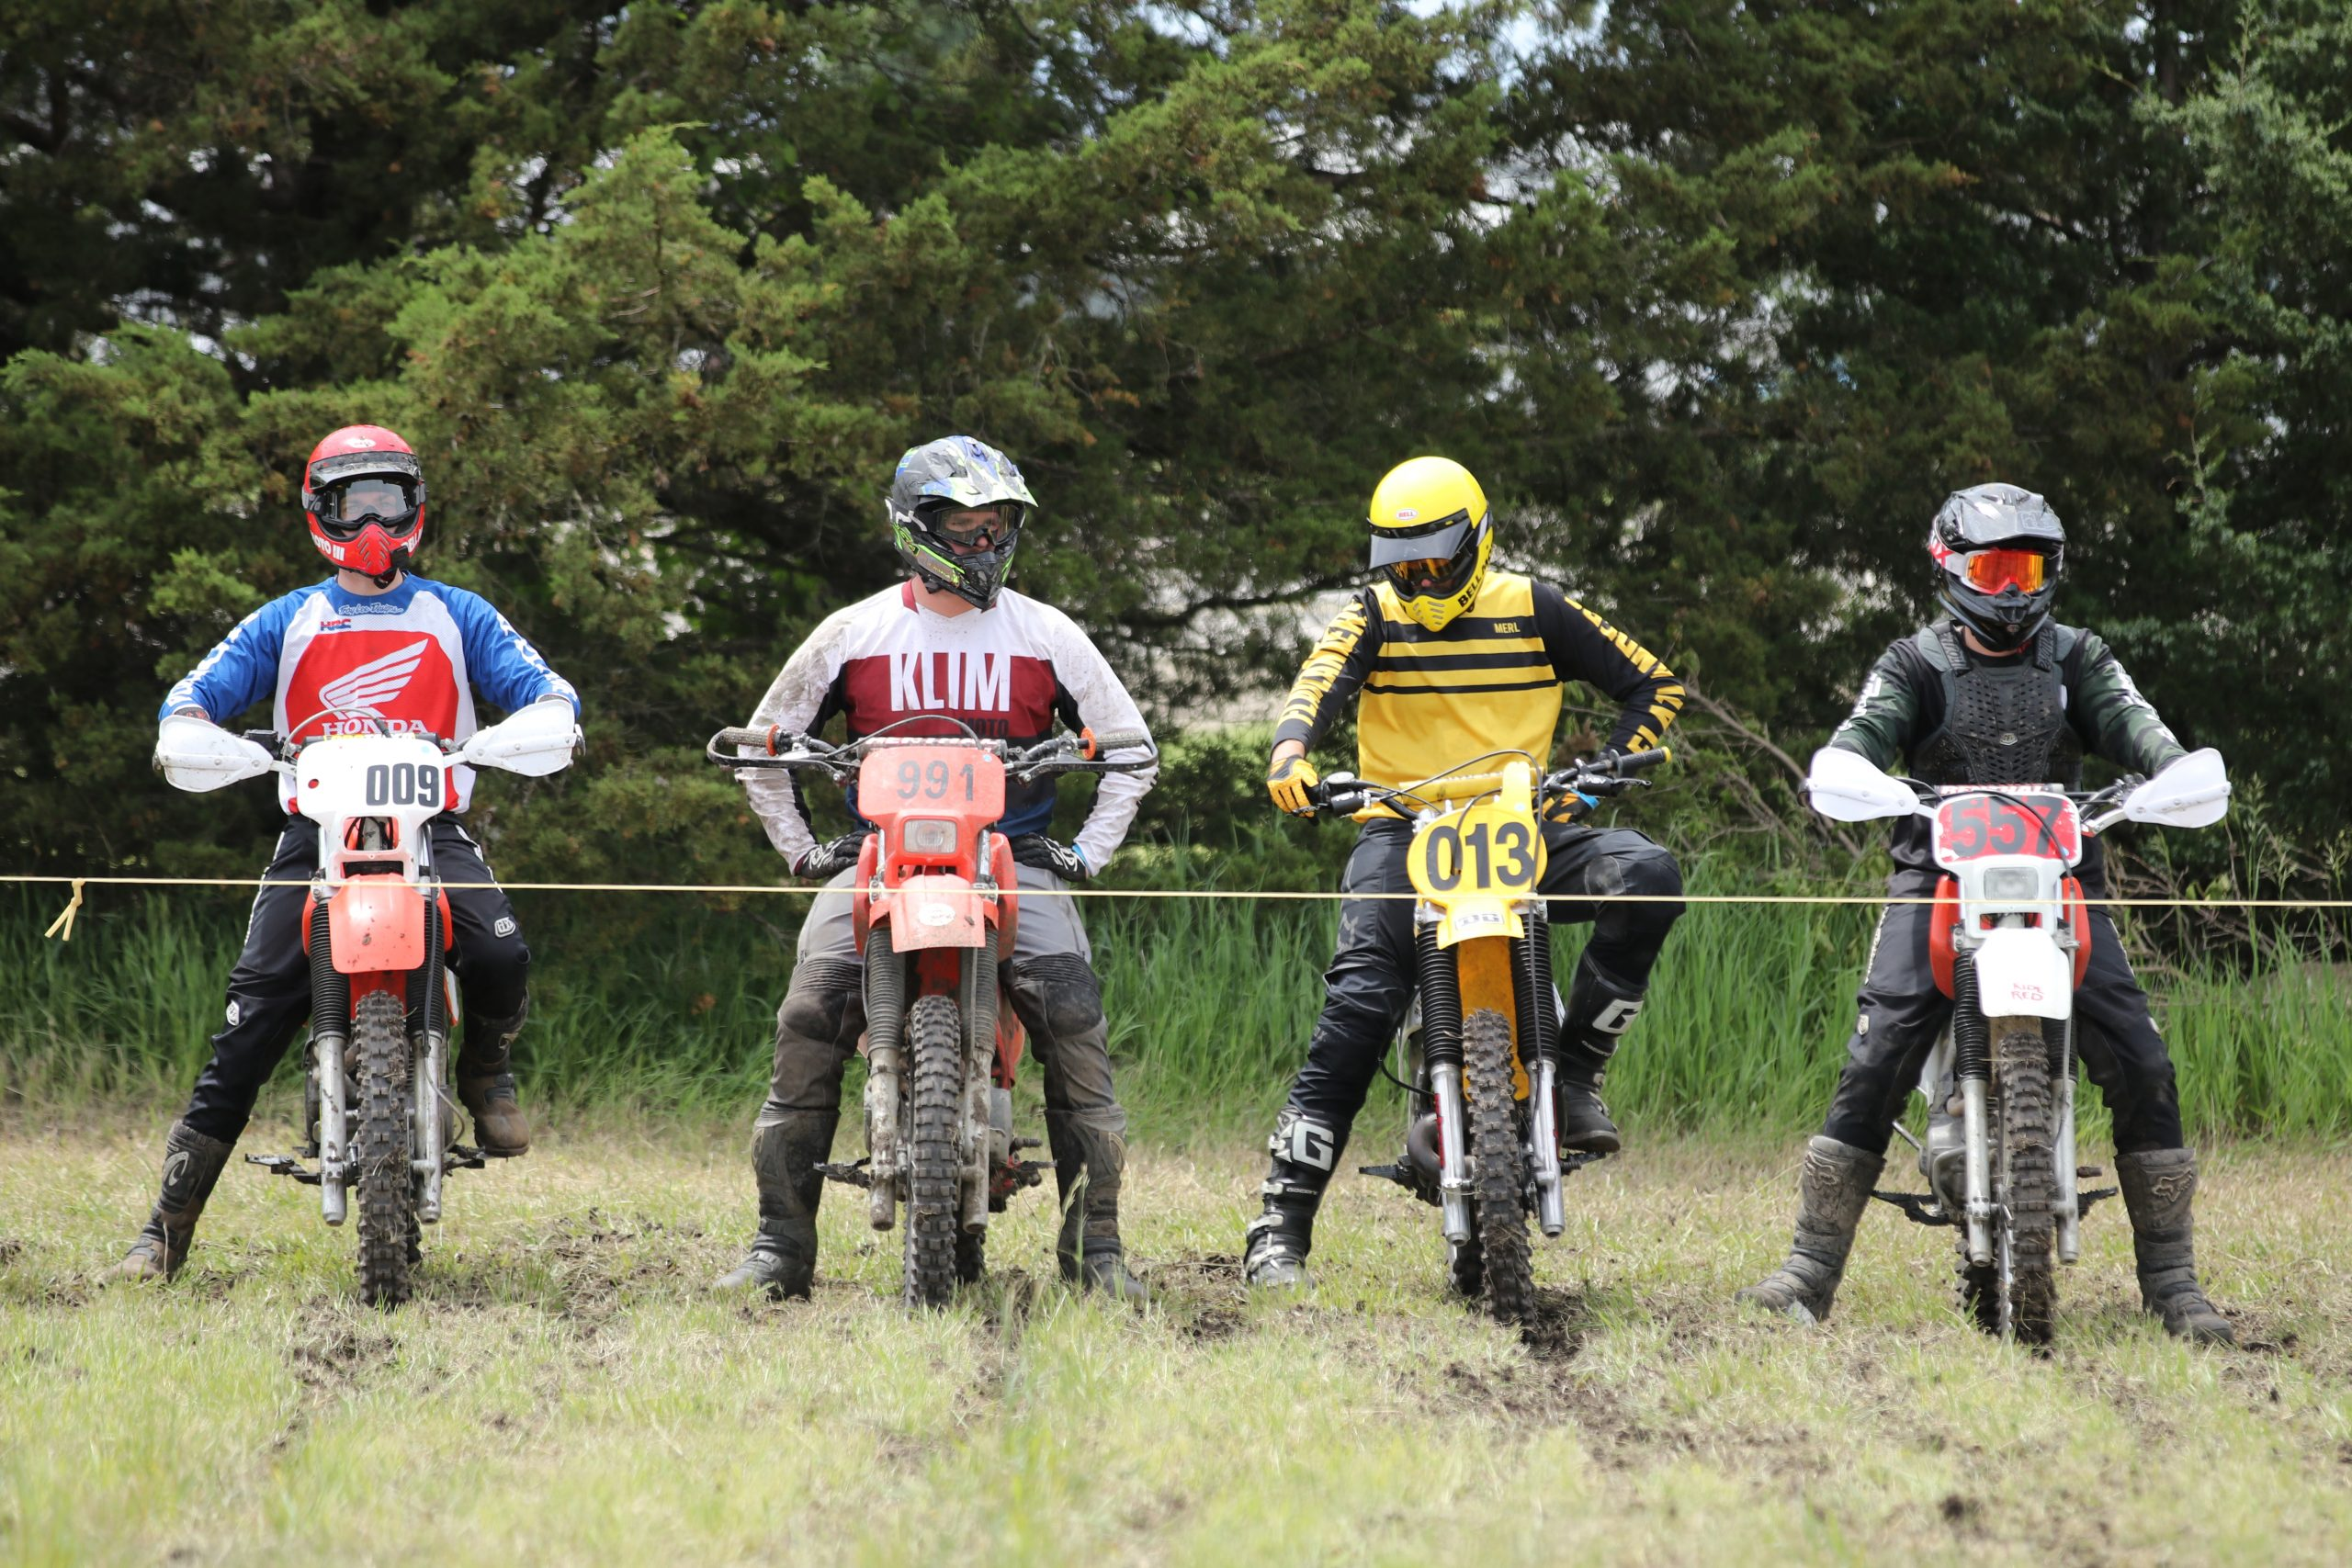 heartland motofest Kyle Smith flatlanders starting line